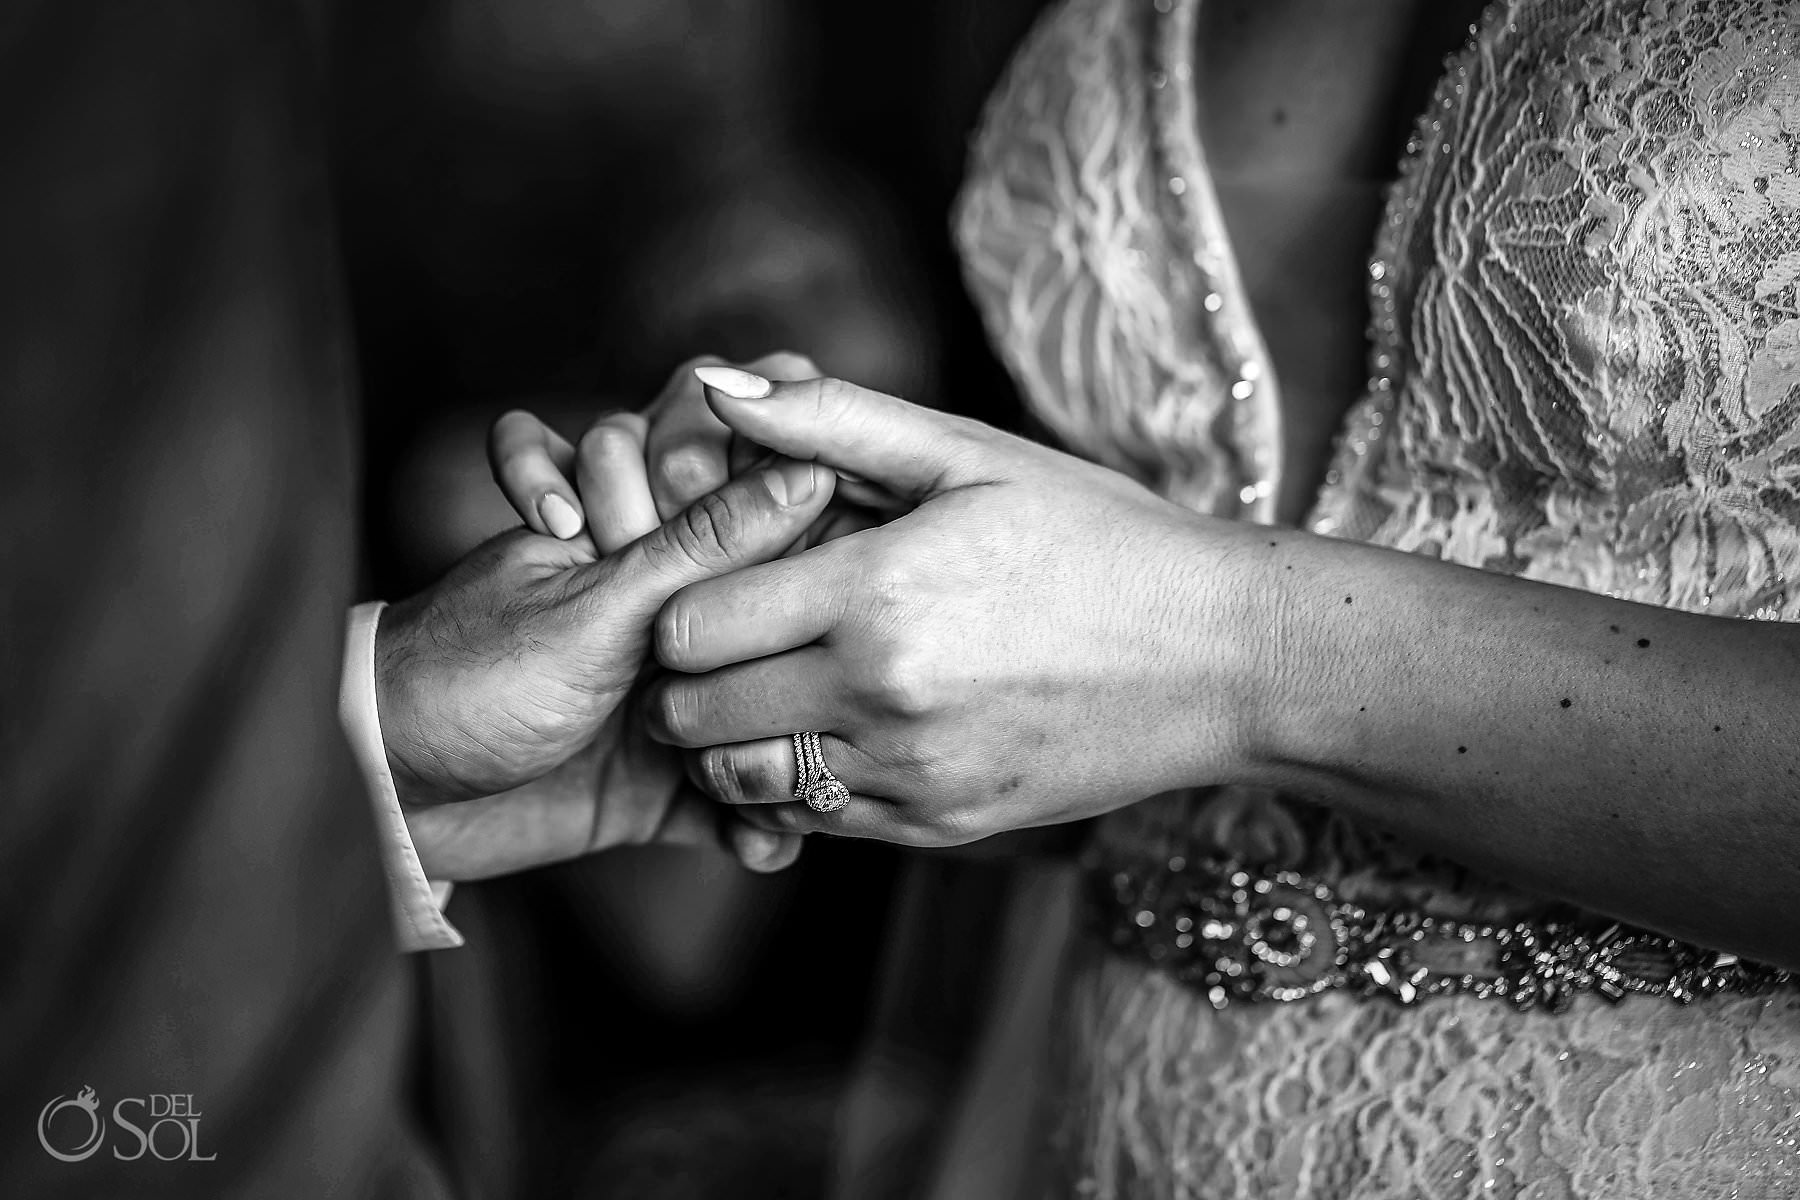 webdding details ring exchange Secrets the Vine wedding photographer